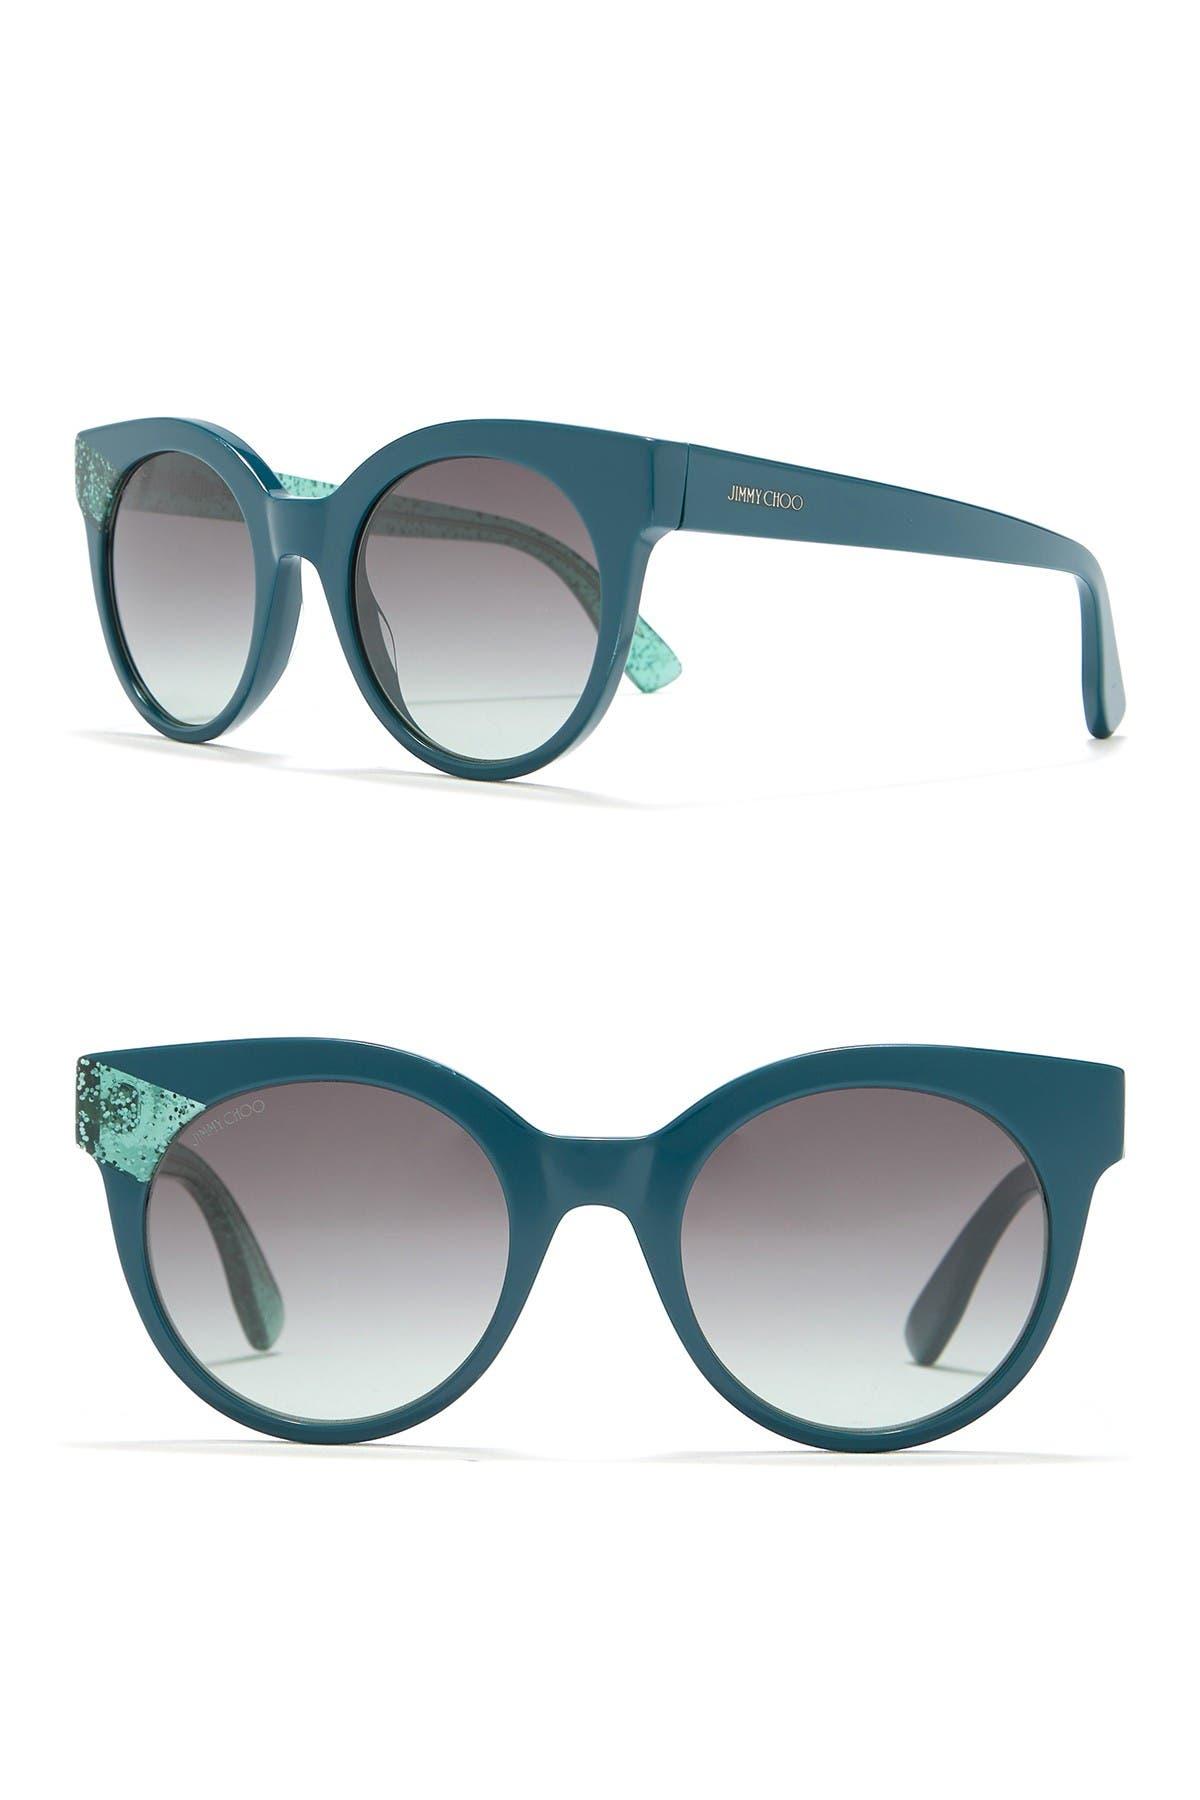 Image of Jimmy Choo Mirta 49mm Round Cat Eye Sunglasses